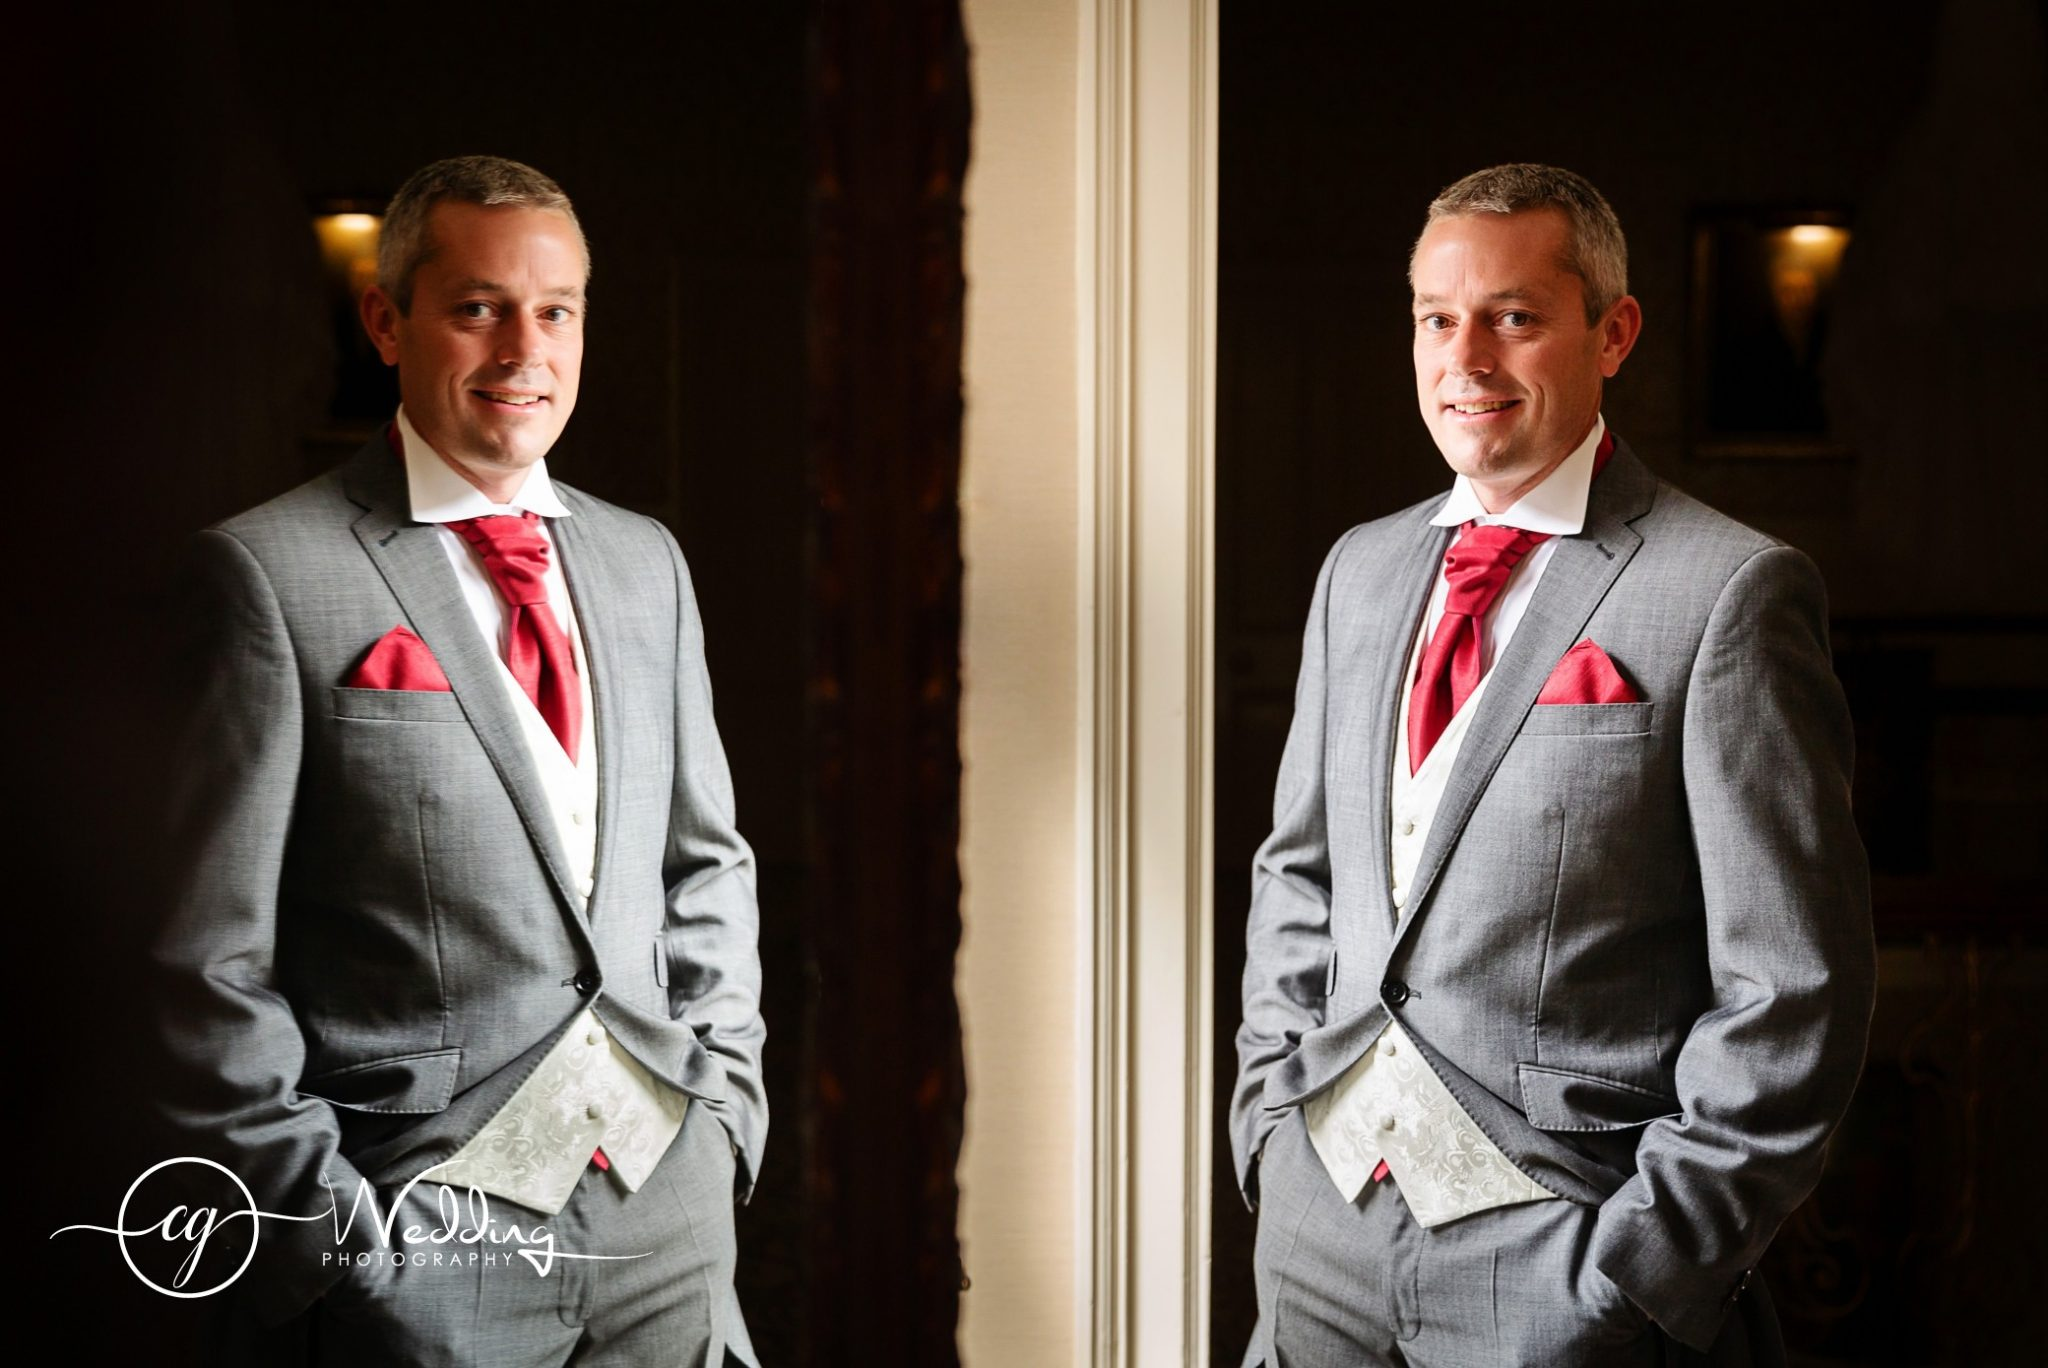 Petersham-Hotel-Richmond-Wedding-Photography-Nicky-and-John18